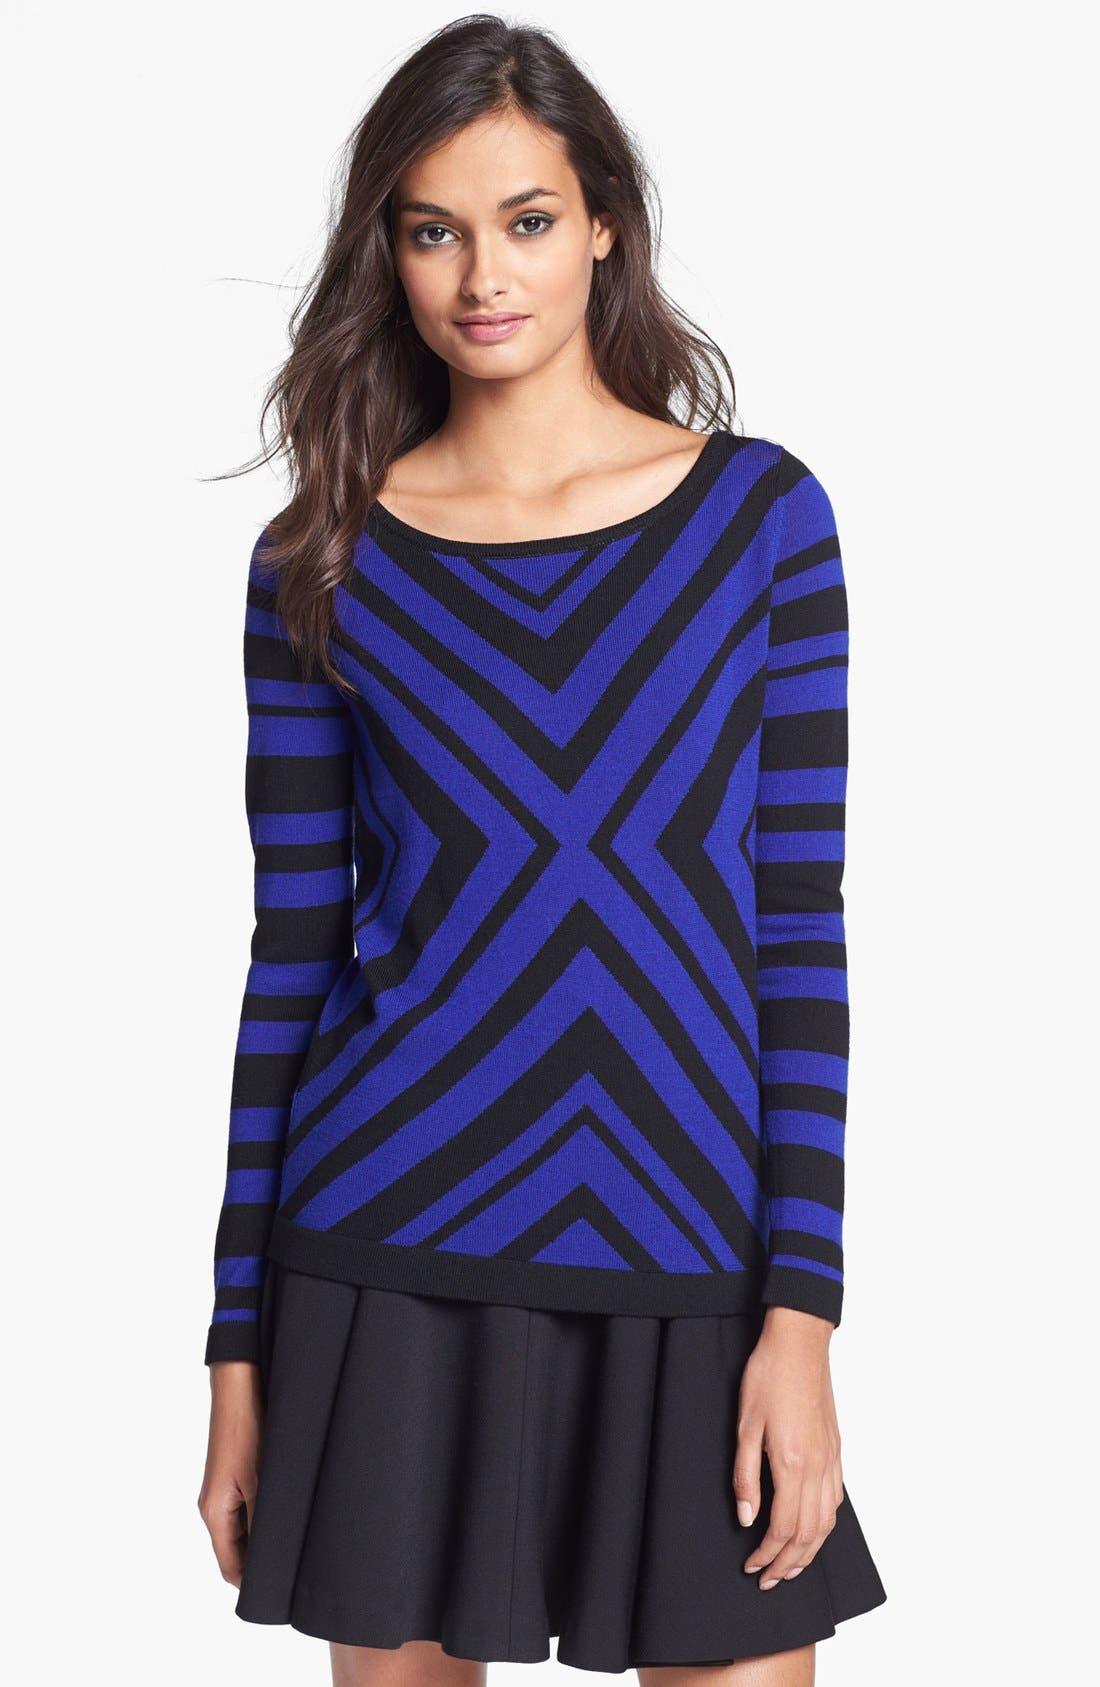 Alternate Image 1 Selected - Milly Merino Wool Sweater